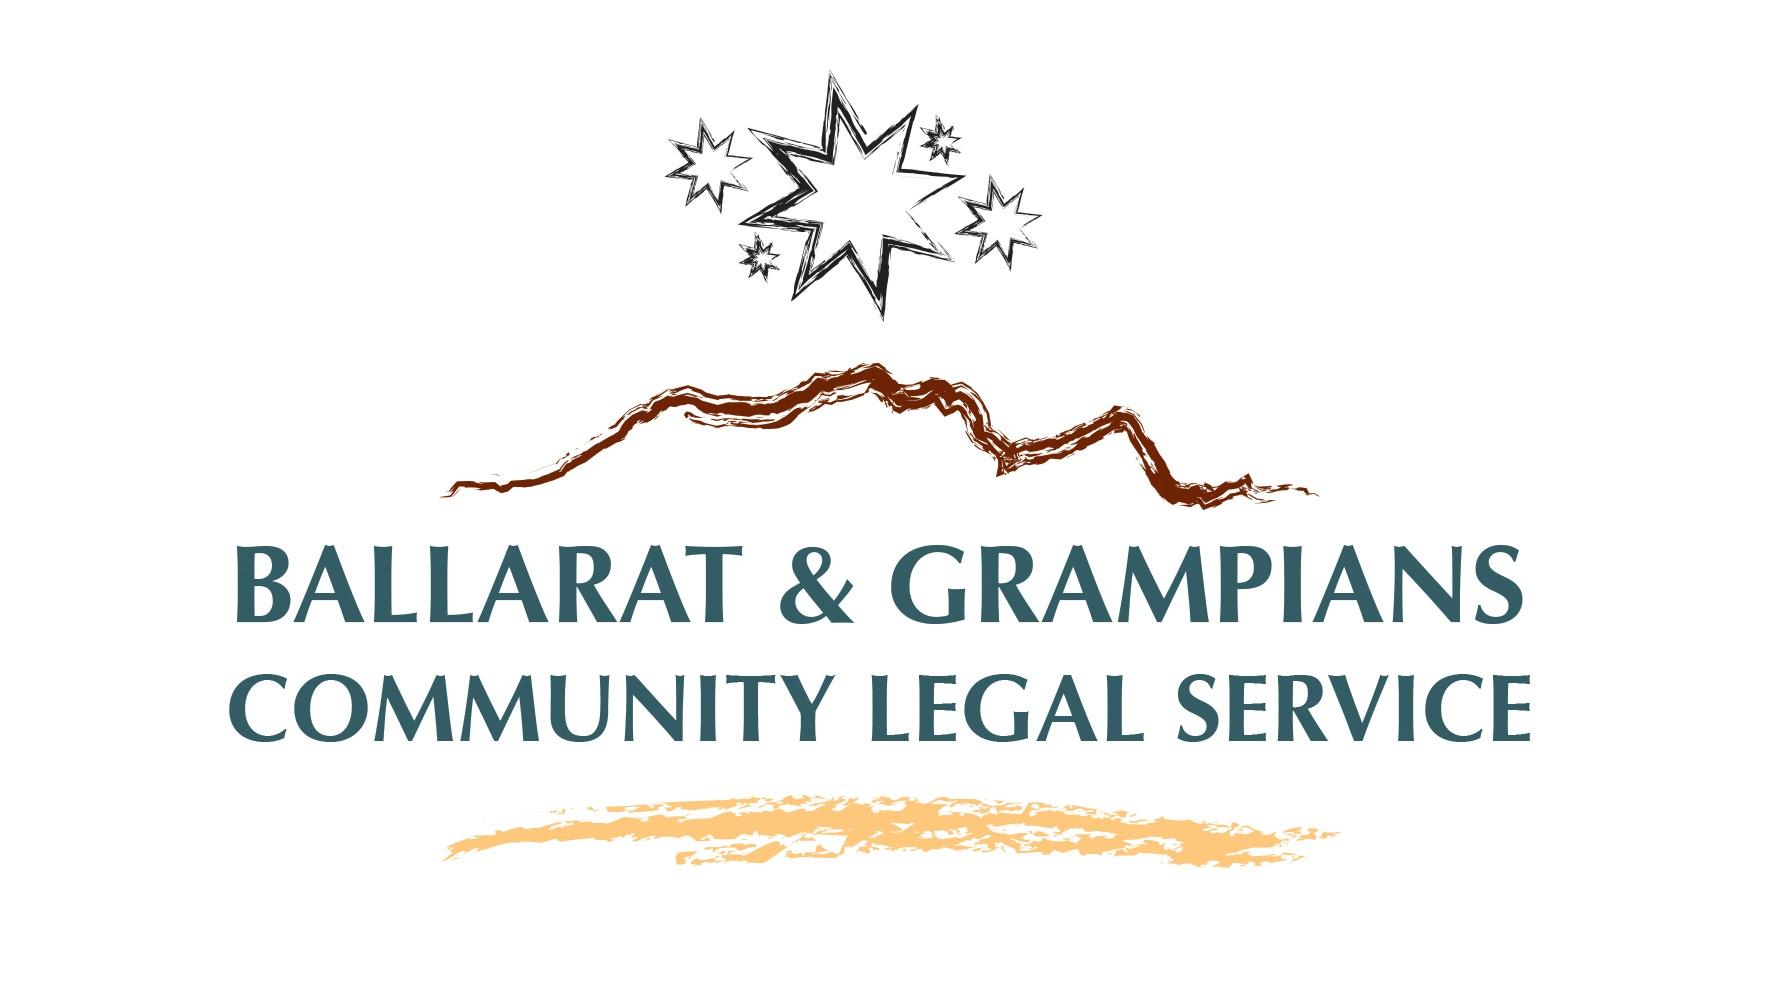 Ballarat dating service